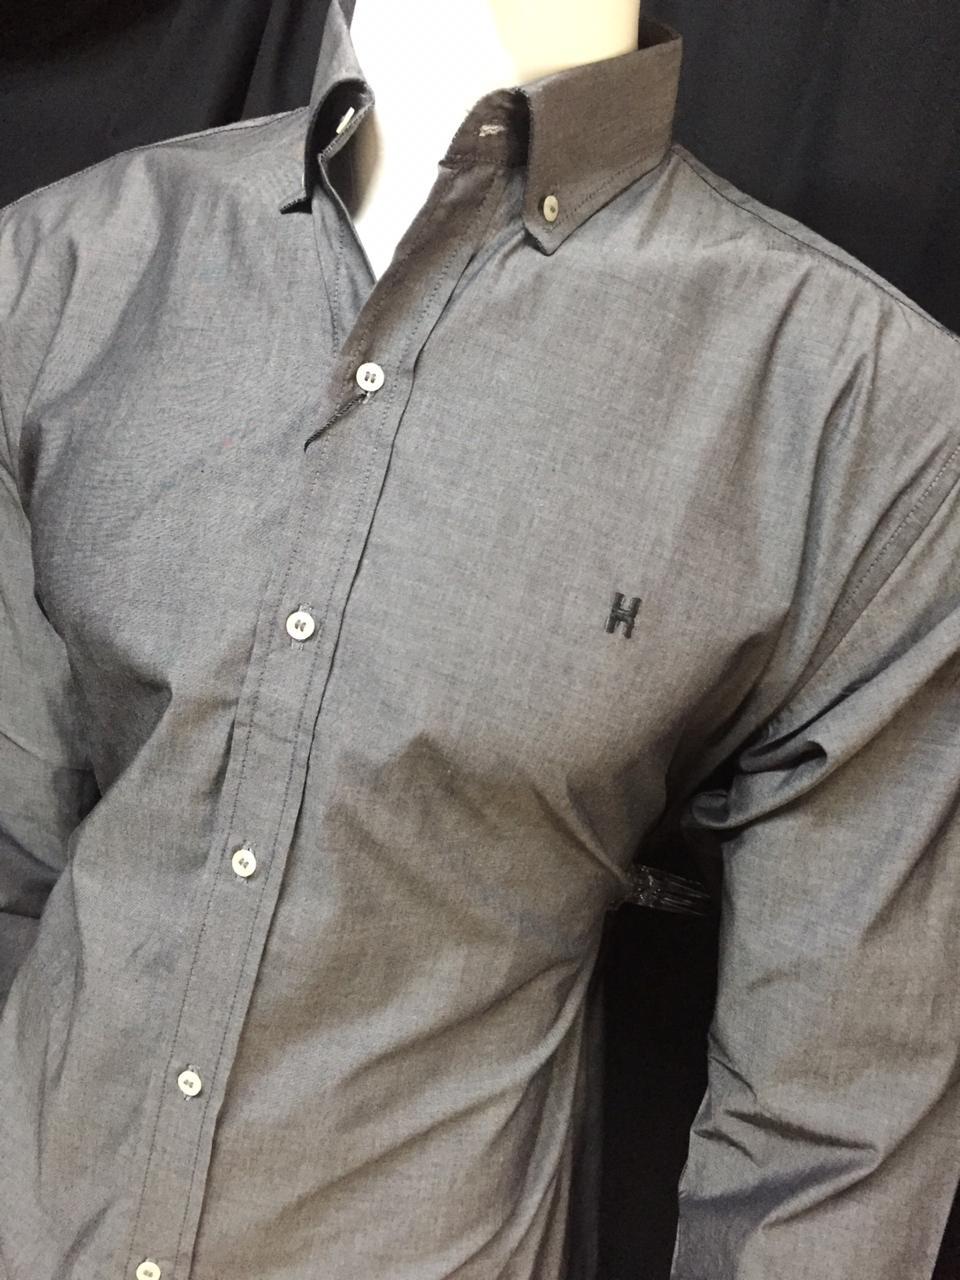 Camisa Masculina Txc Manga Longa Algodão Lisa - Cinza Escuro